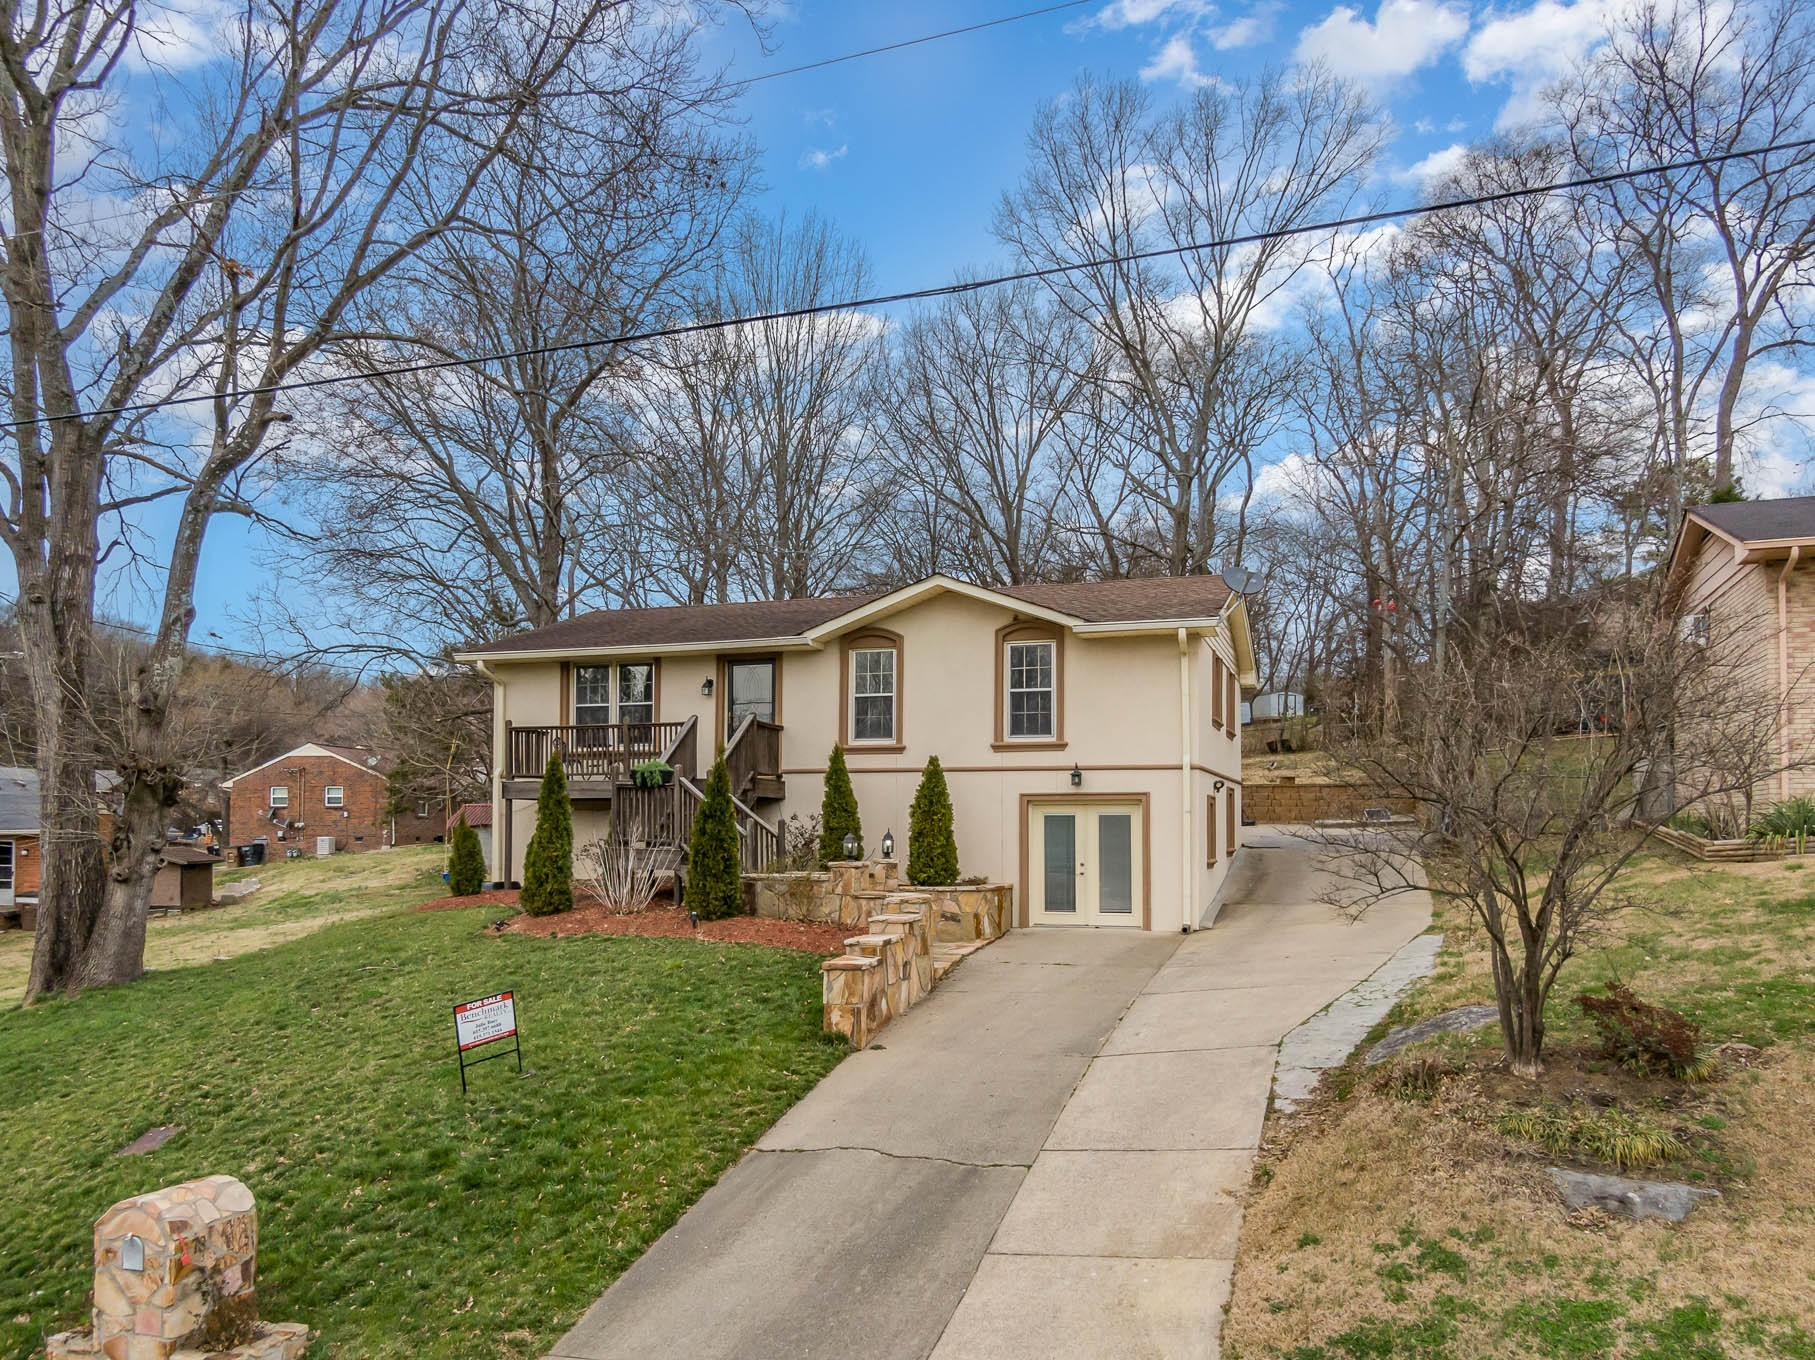 278 Townes Dr Property Photo - Nashville, TN real estate listing